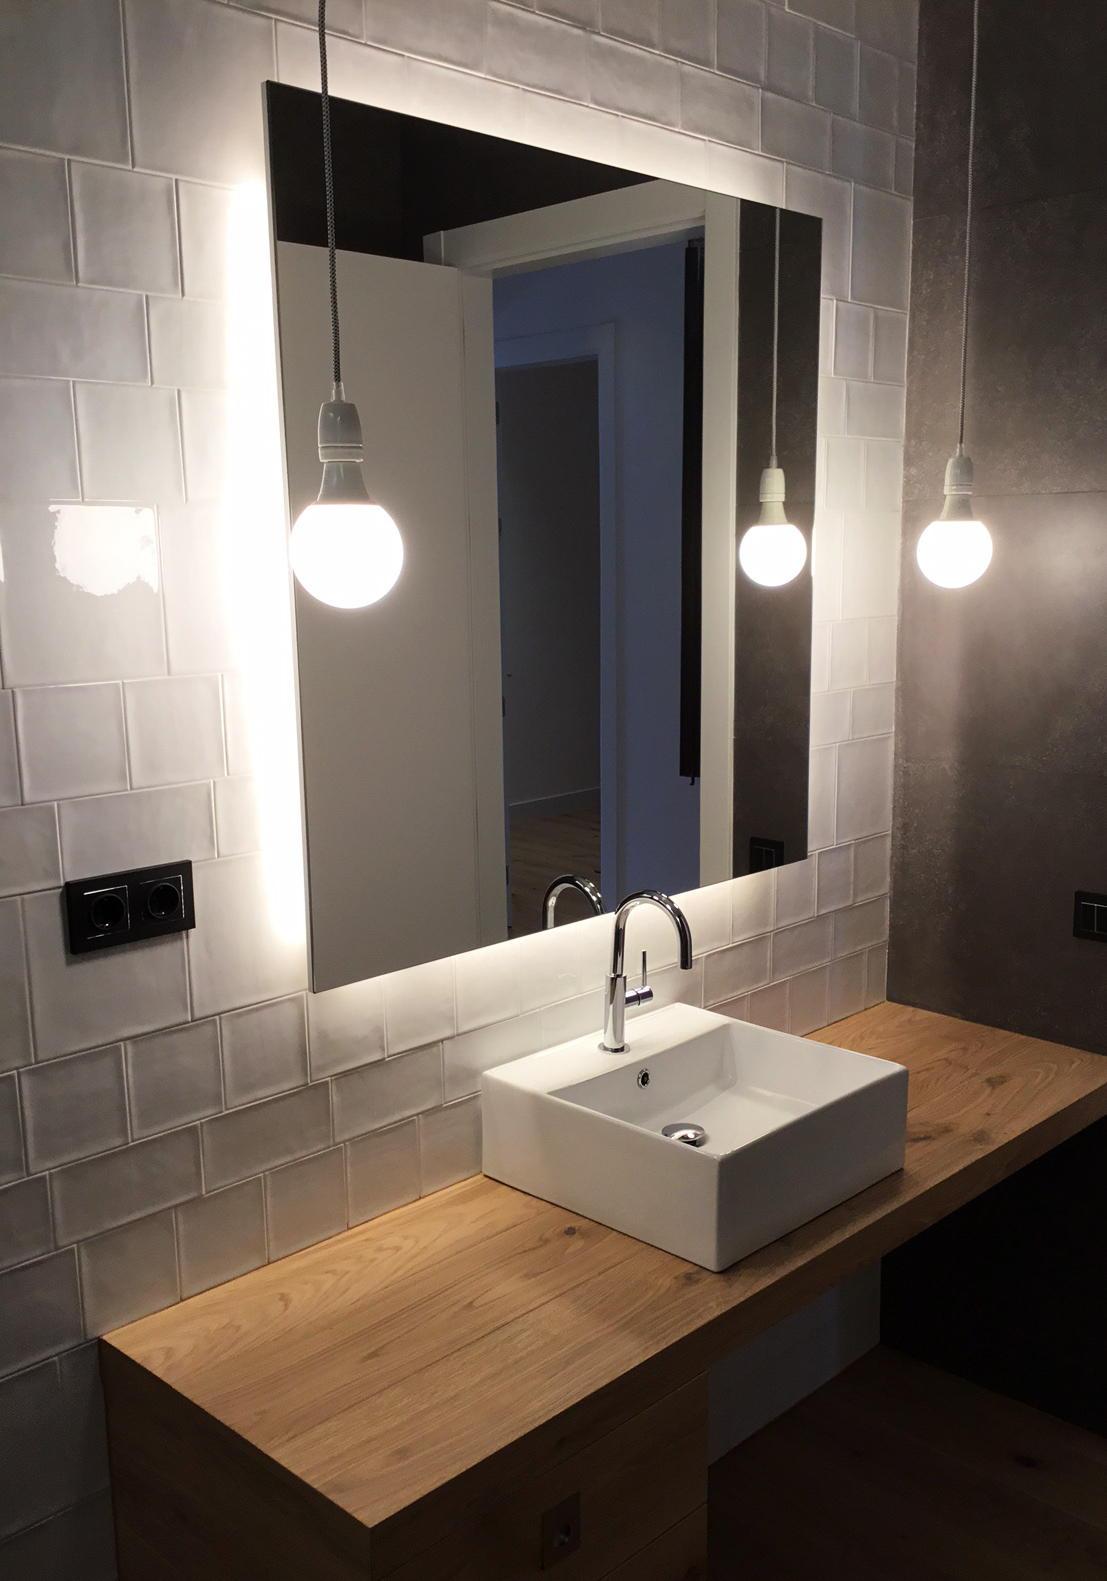 Proyecto de iluminacin interior en rehabilitacin de vivienda